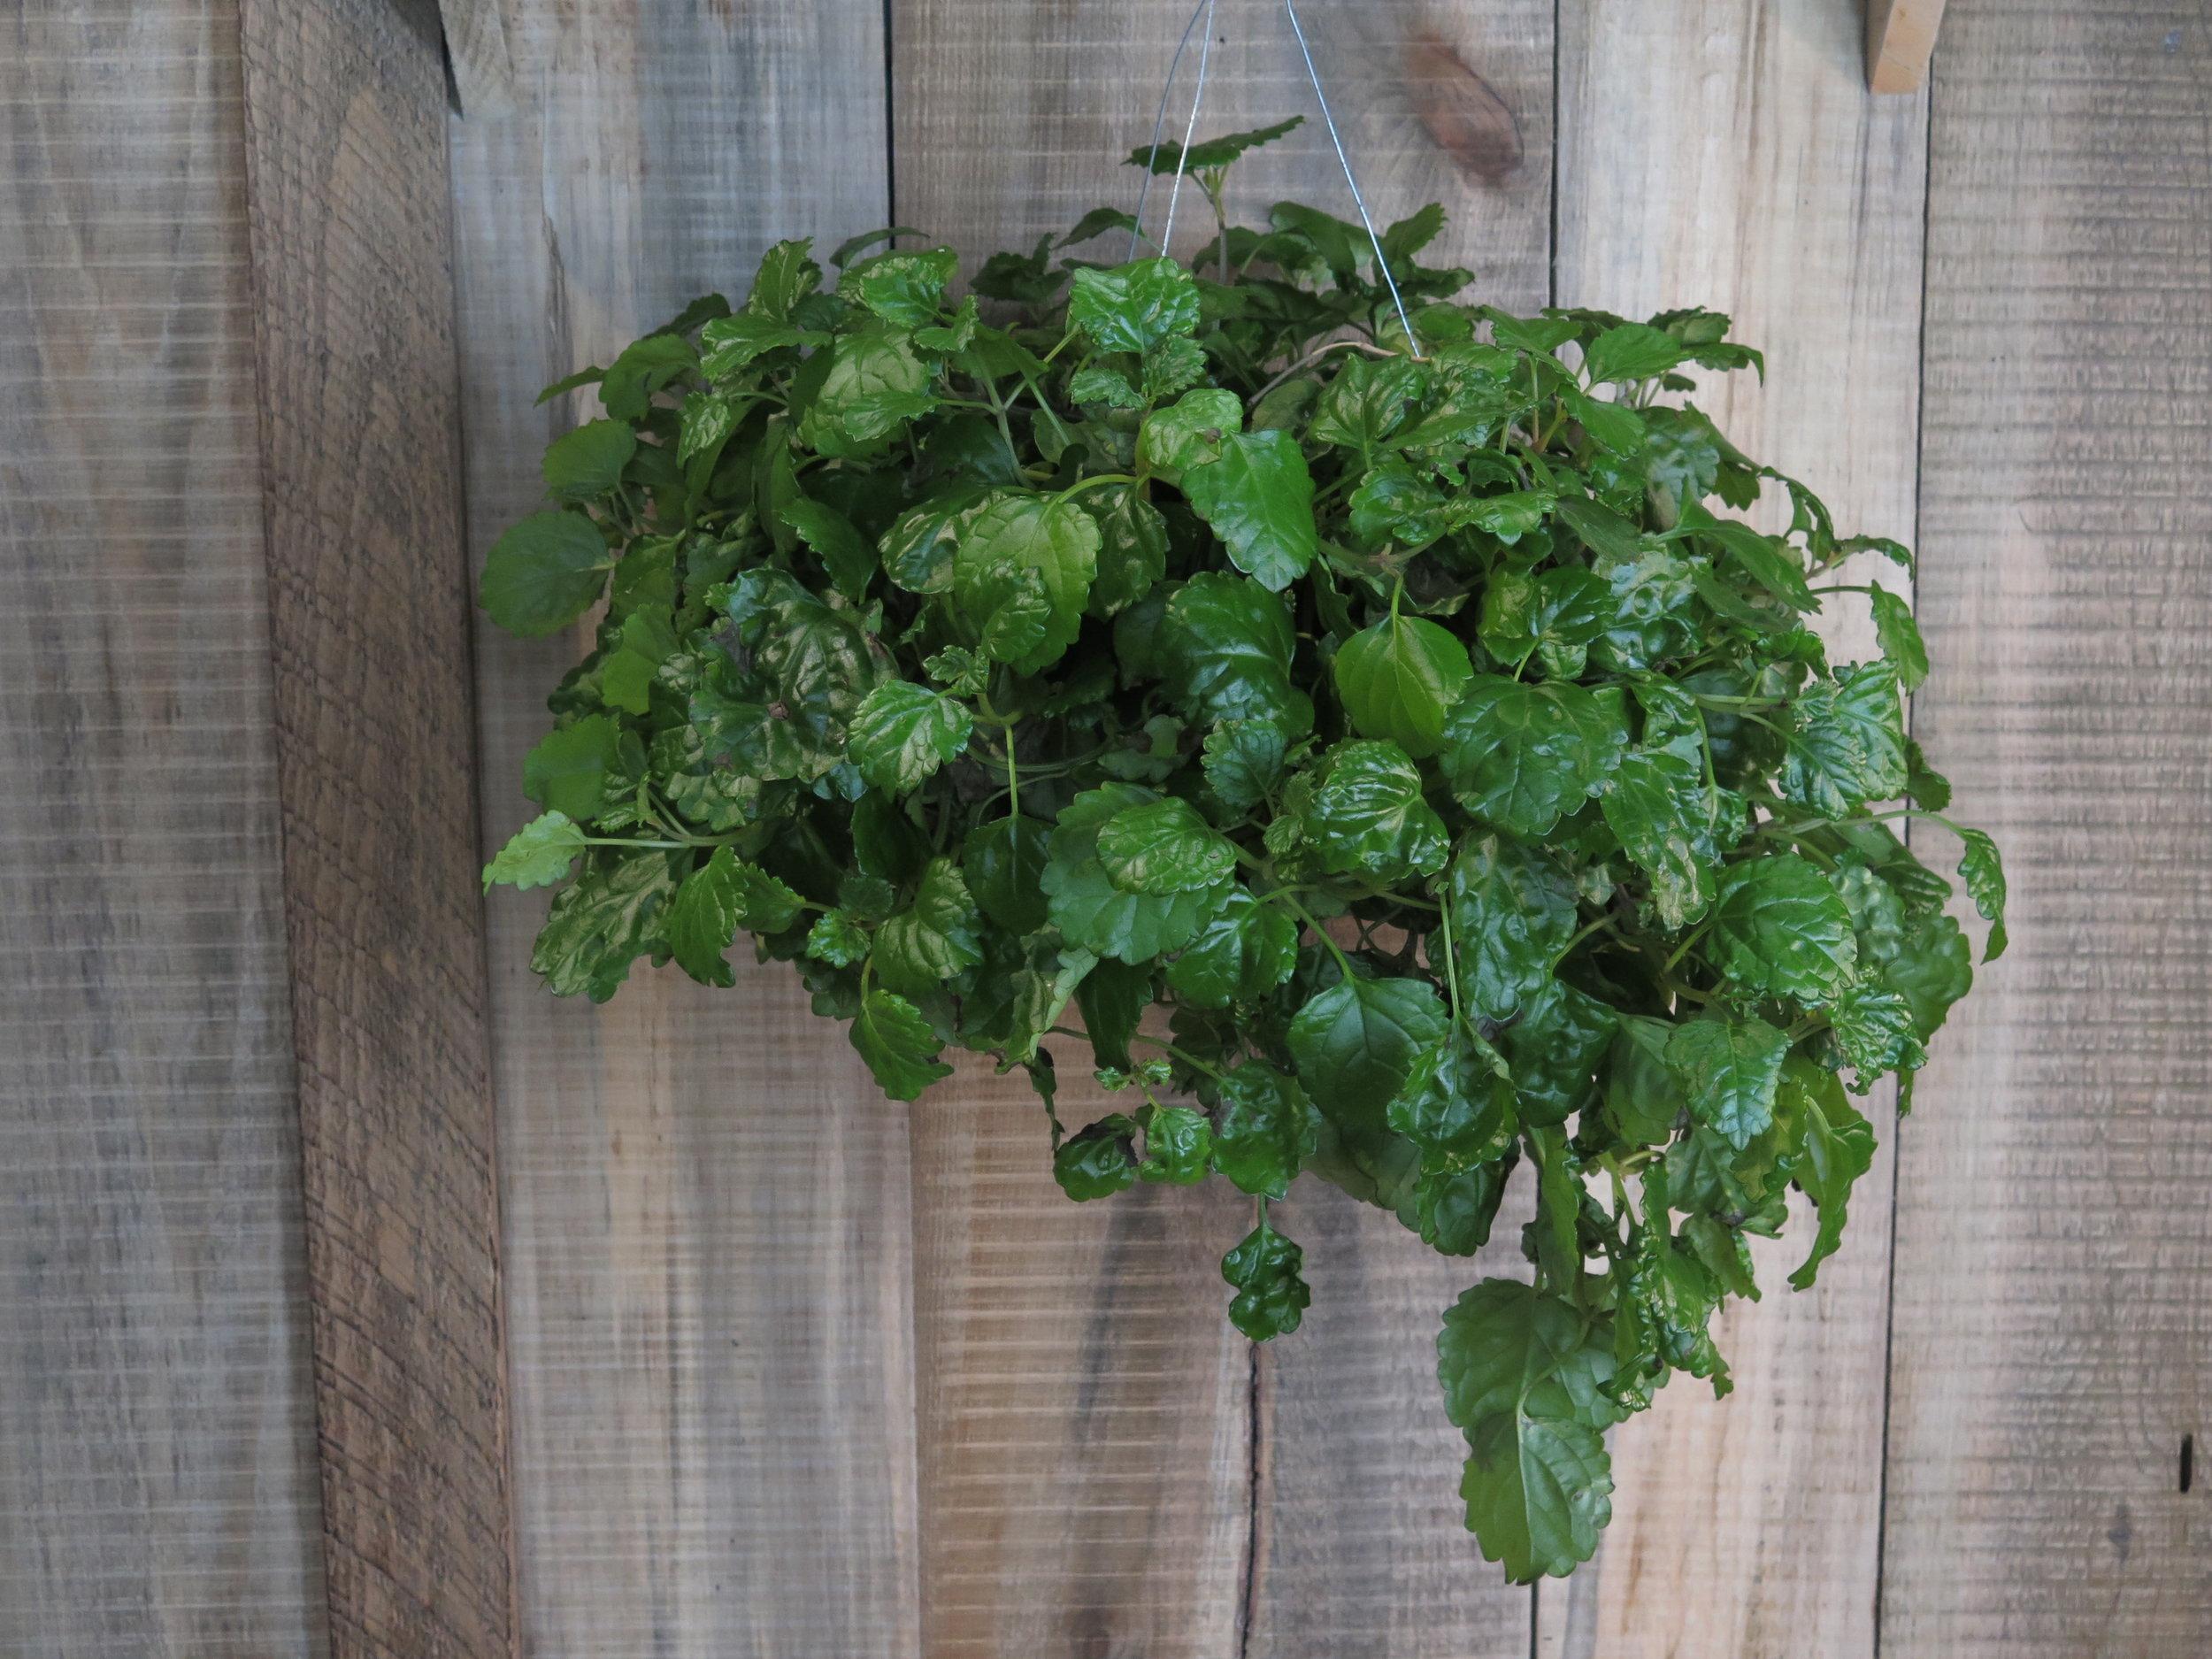 Swedish Ivy -Plectranthus verticillatus